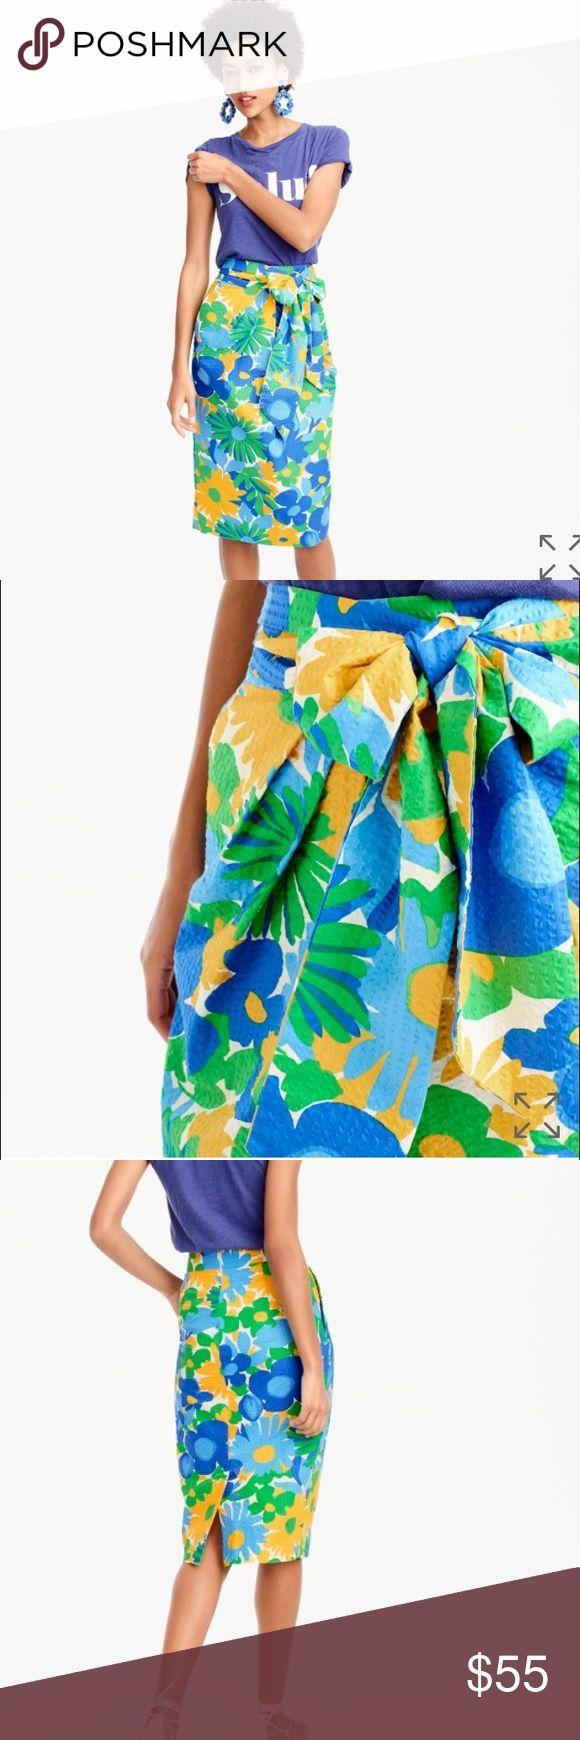 NWT {JCrew} Tie-waist skirt Unworn. Tie-waist skirt in puckered morning floral. Size: 2. Color: Multi J. Crew Skirts Pencil